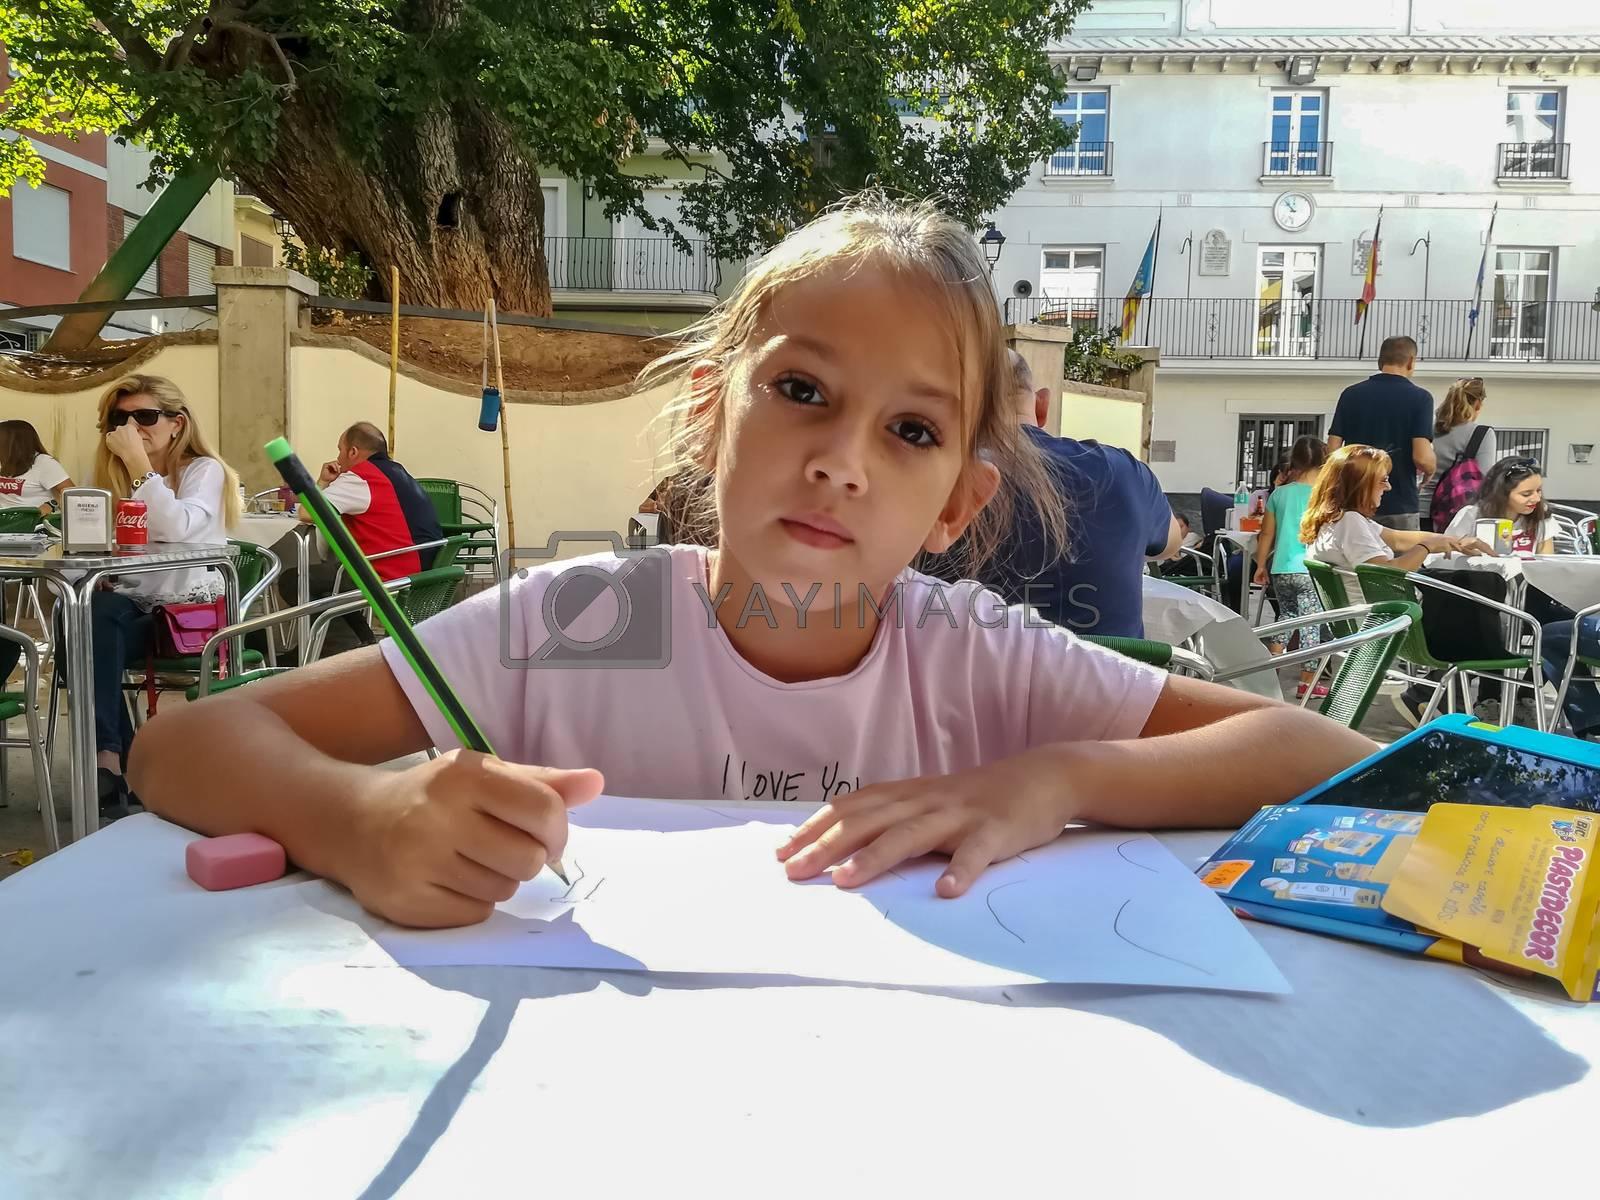 Navajas, Spain 10/12/2018: Little girl drawing by Barriolo82